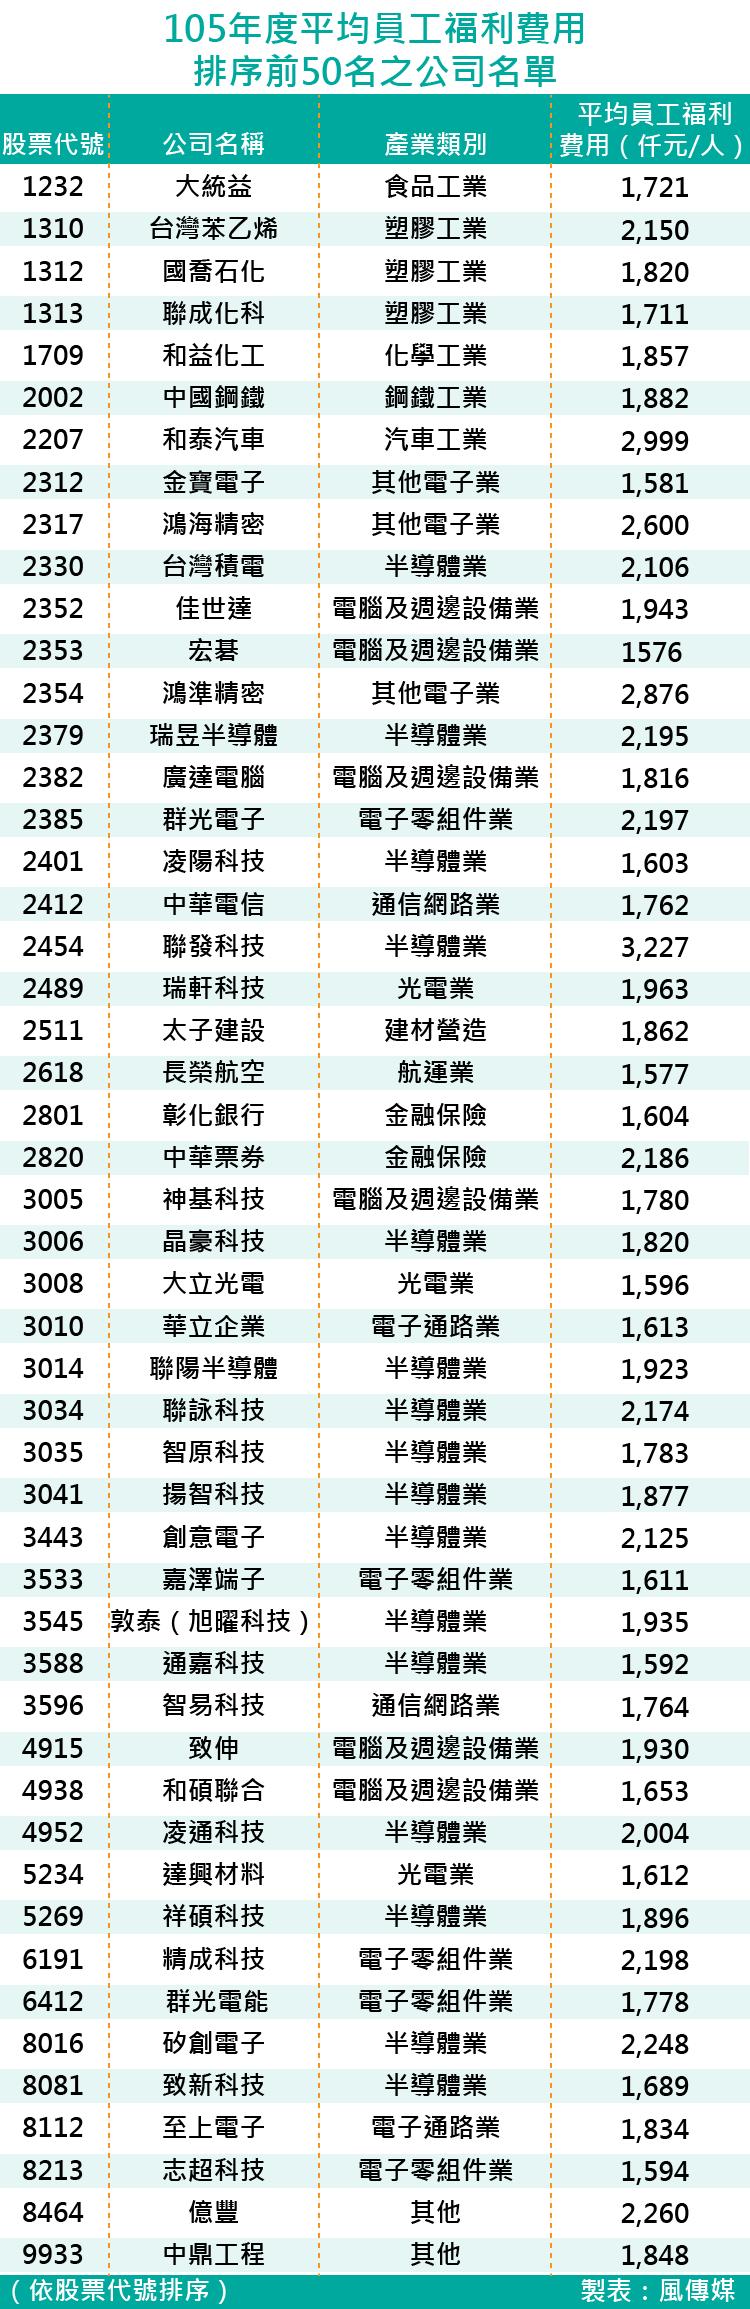 20170607-SMG0035-105年度平均員工福利費用排序前50名之公司名單-01.png